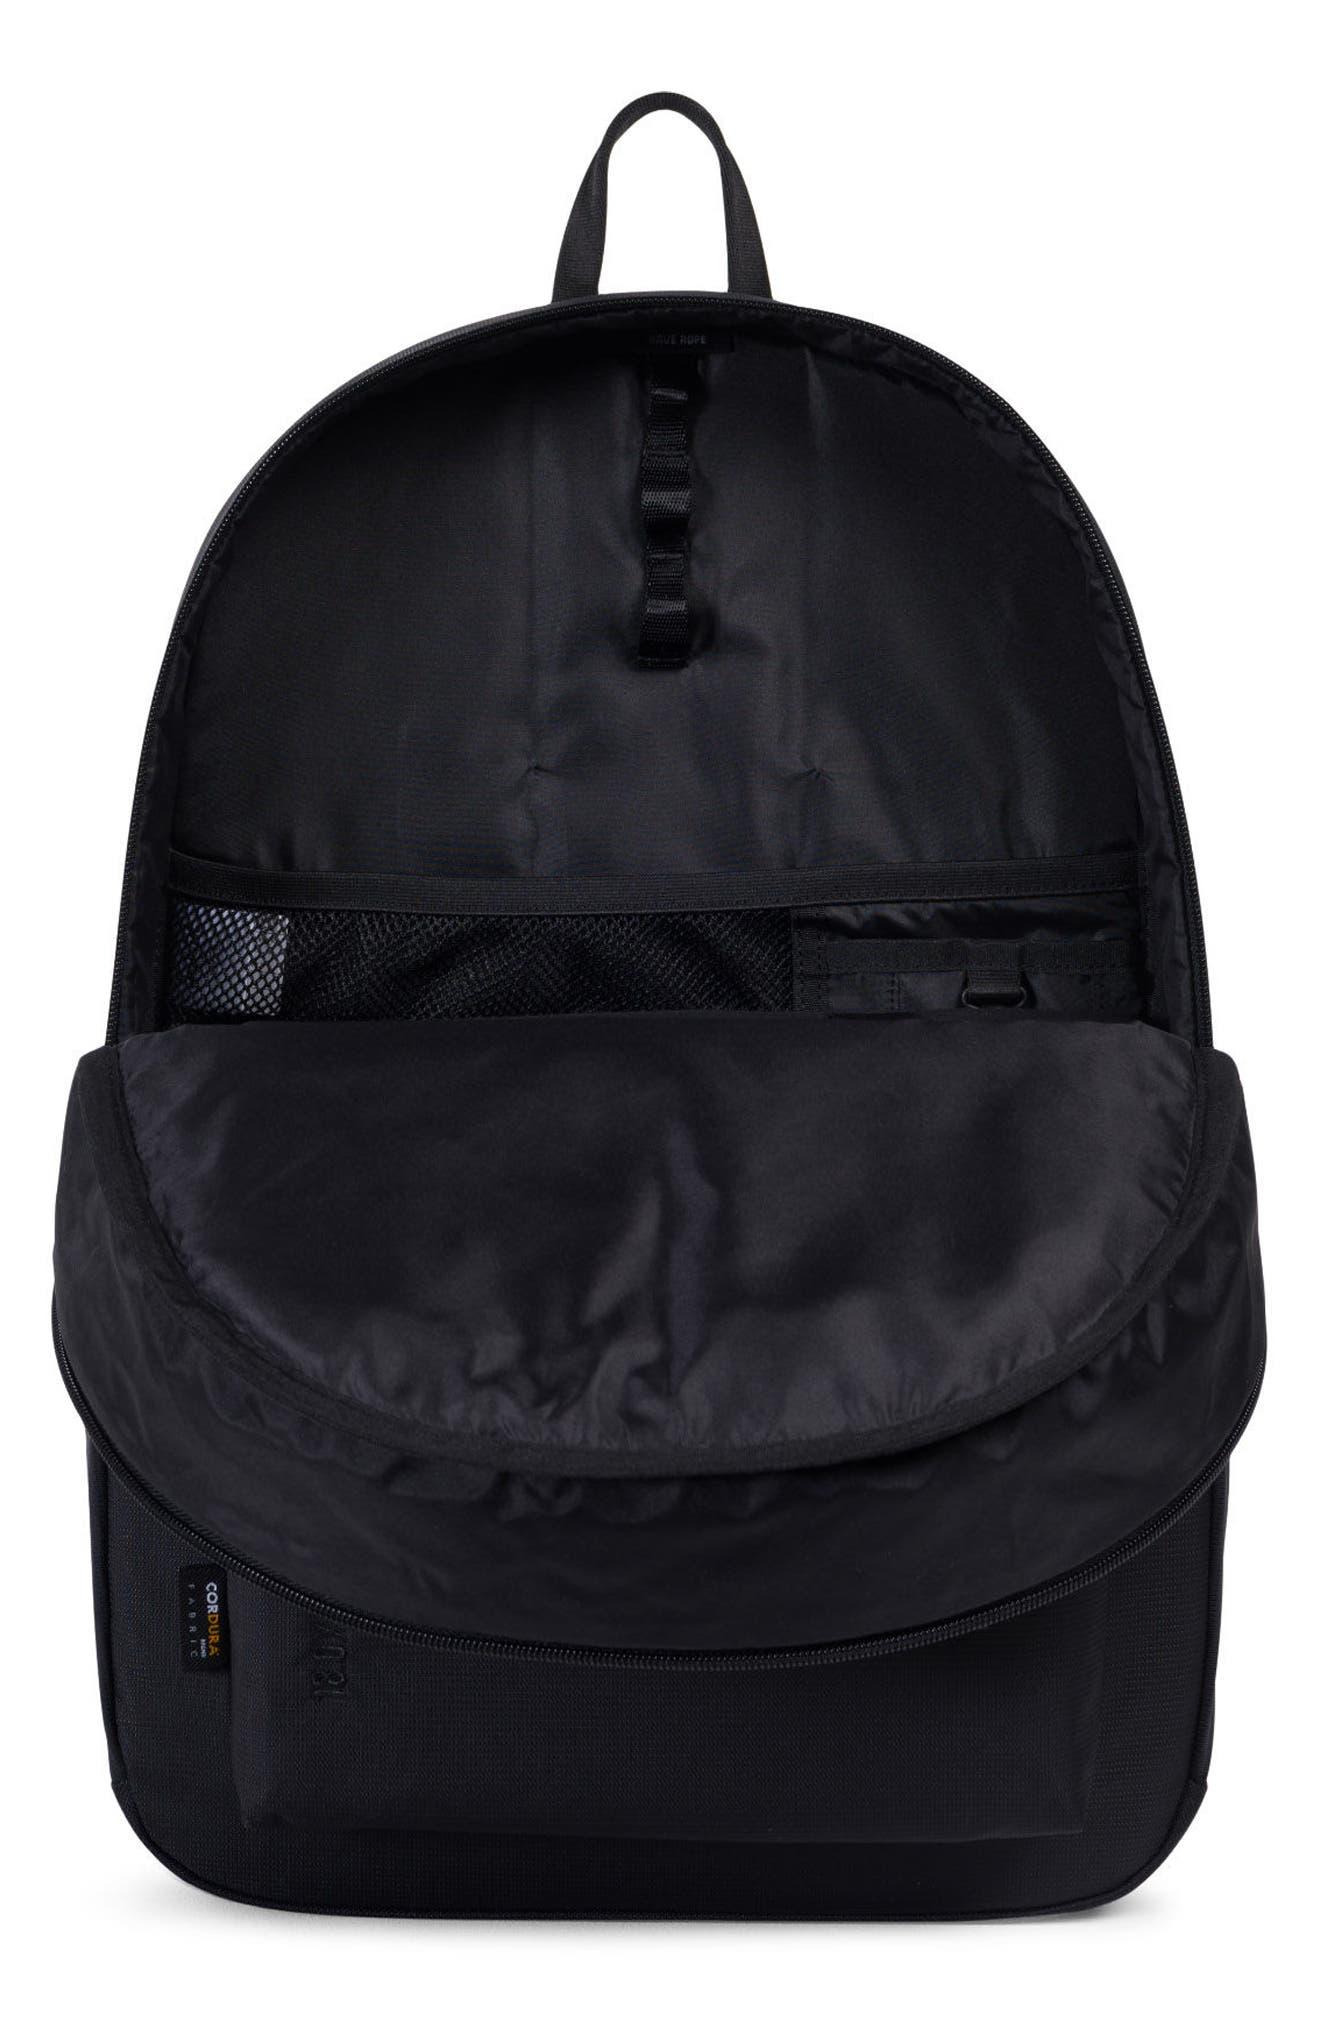 Rundle Trail Backpack,                             Alternate thumbnail 3, color,                             Black